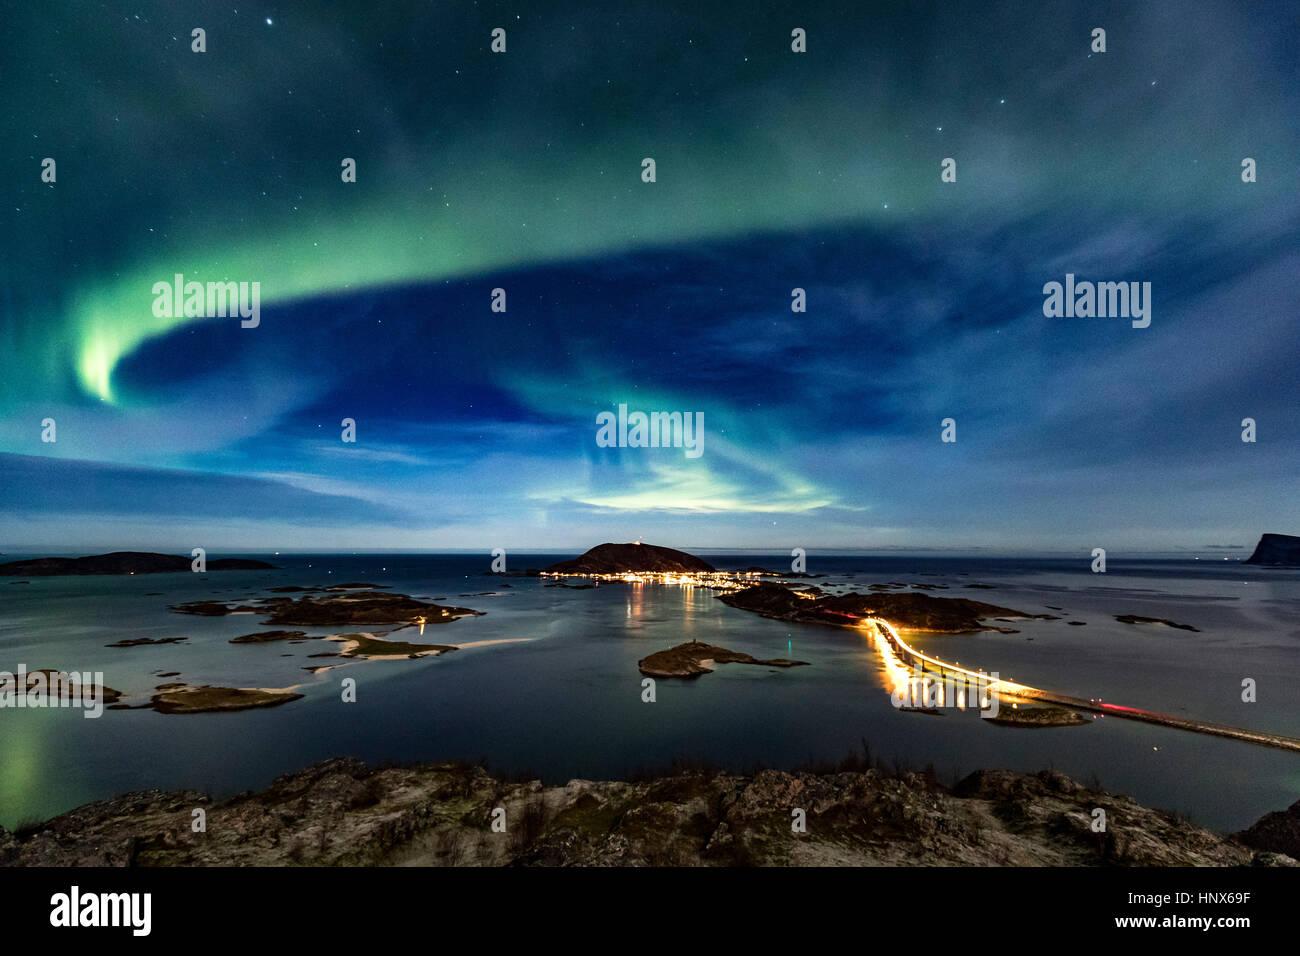 Aurora Borealis in den Nachthimmel über Sommaroy Brücke von Kvaloya Insel Sommaroy Island, Arctic Norwegen Stockbild